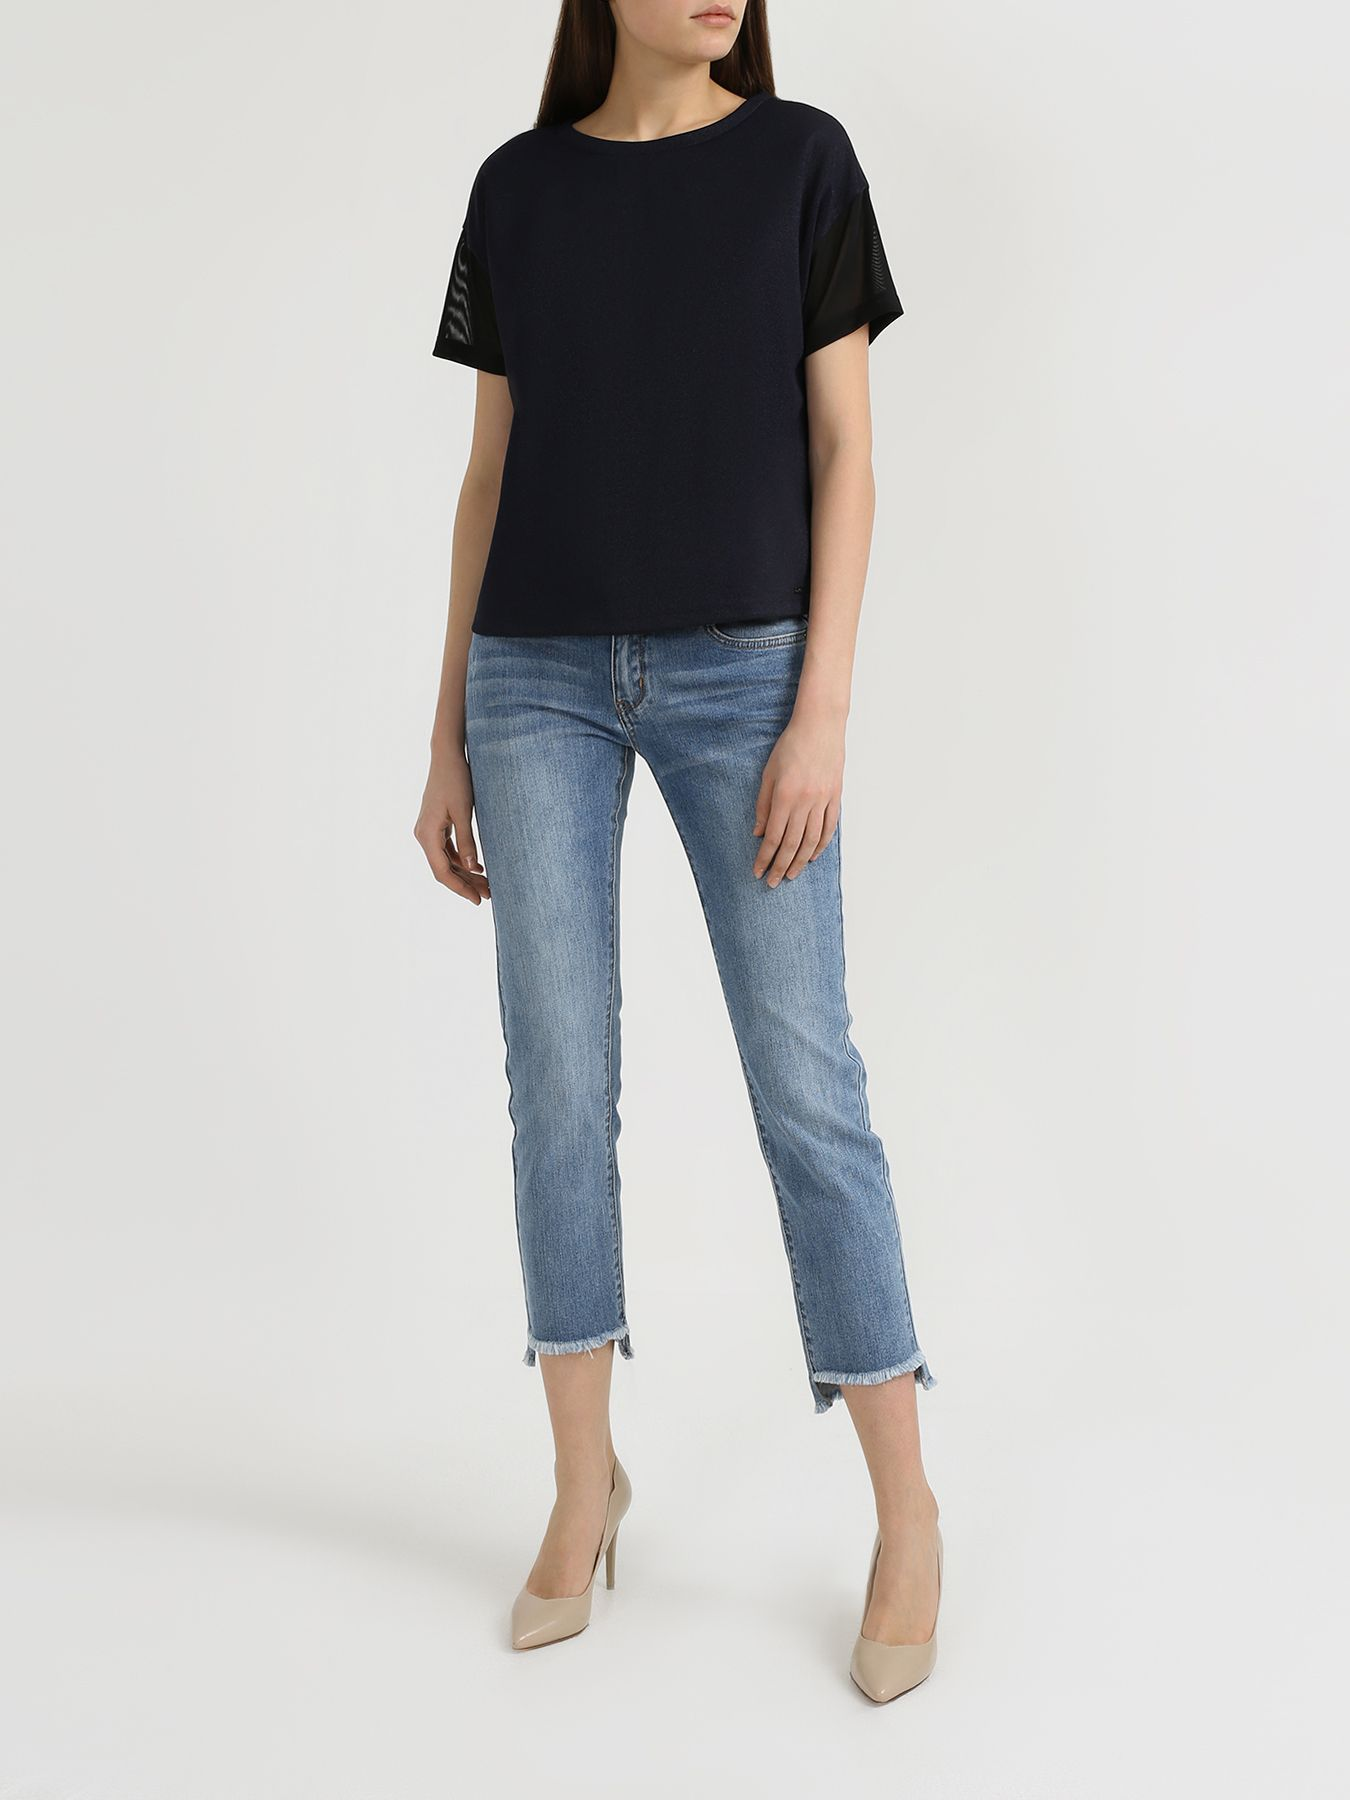 Брюки Korpo Узкие джинсы